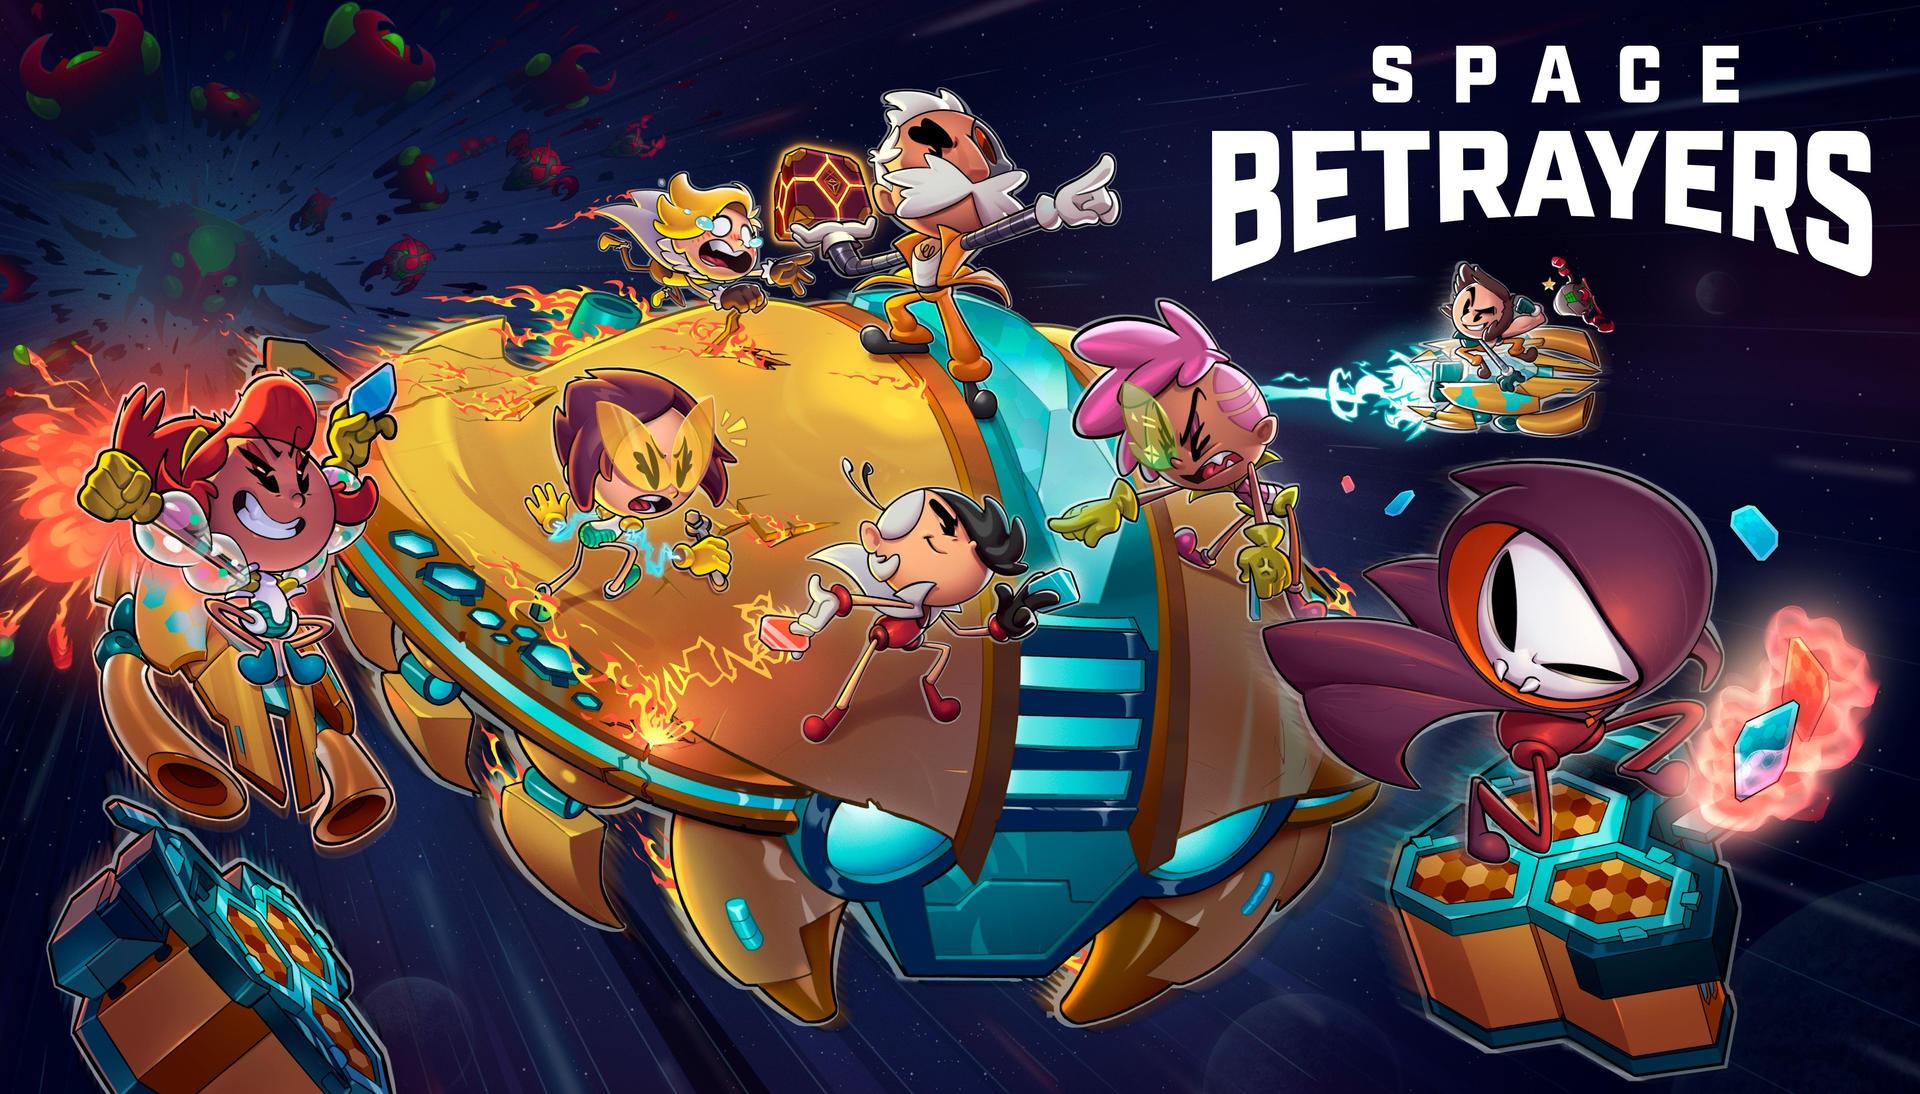 Space Betrayers